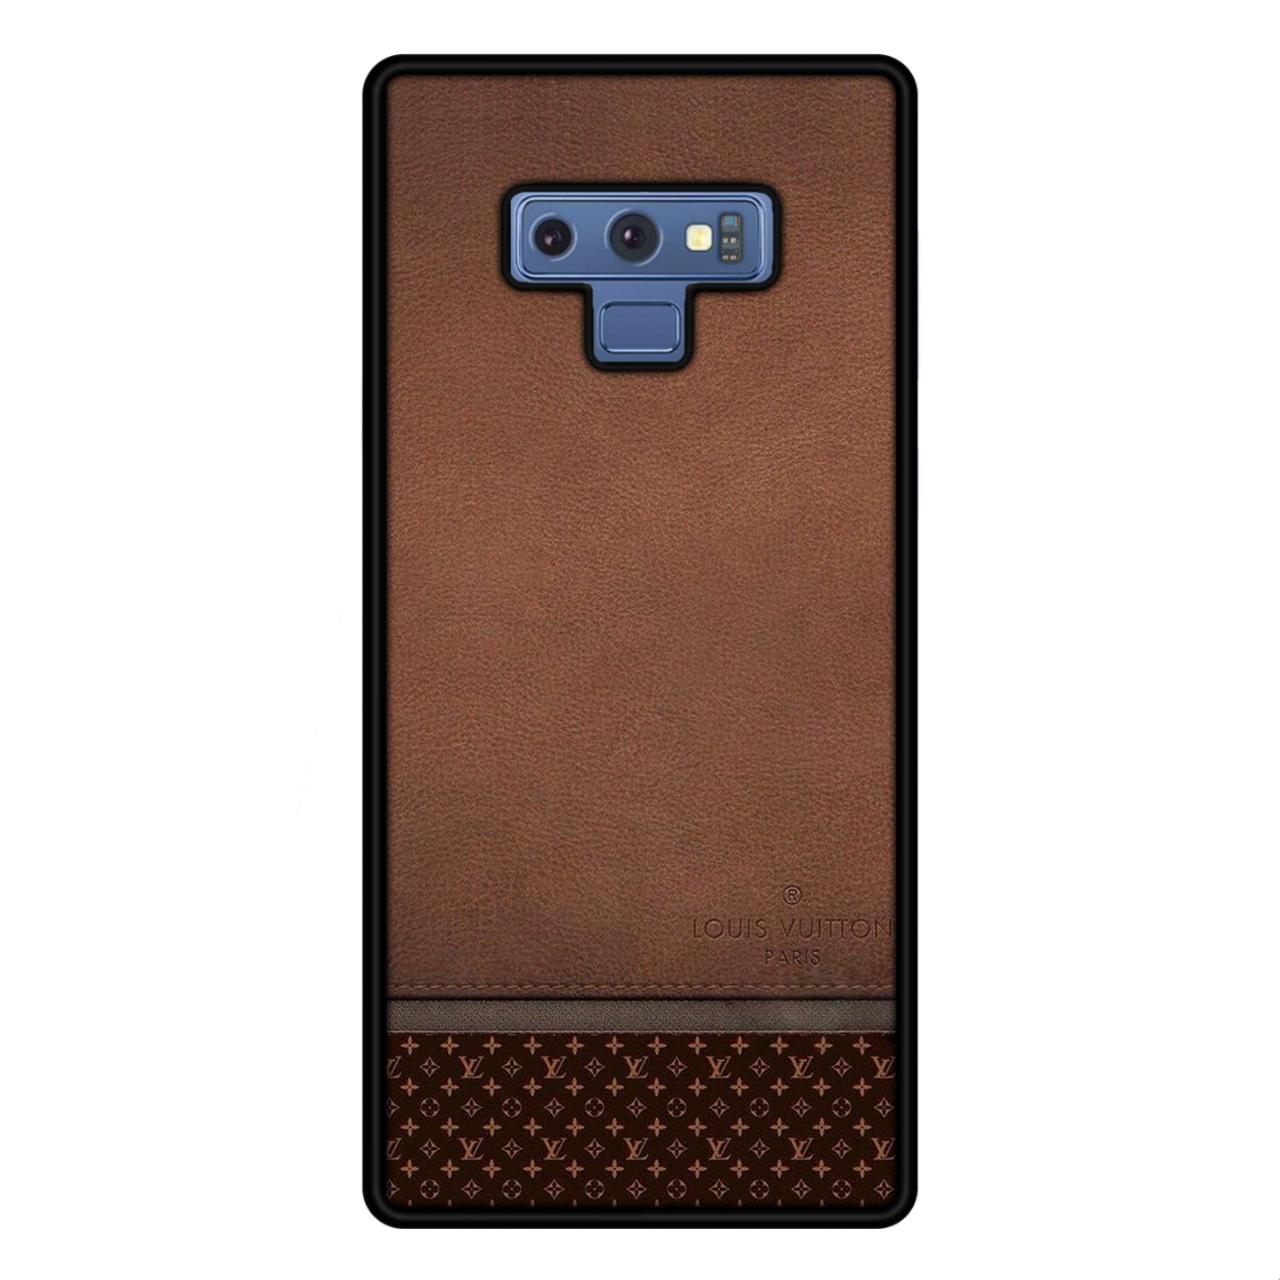 کاور آکام مدل AN91766 مناسب برای گوشی موبایل سامسونگ Galaxy Note 9